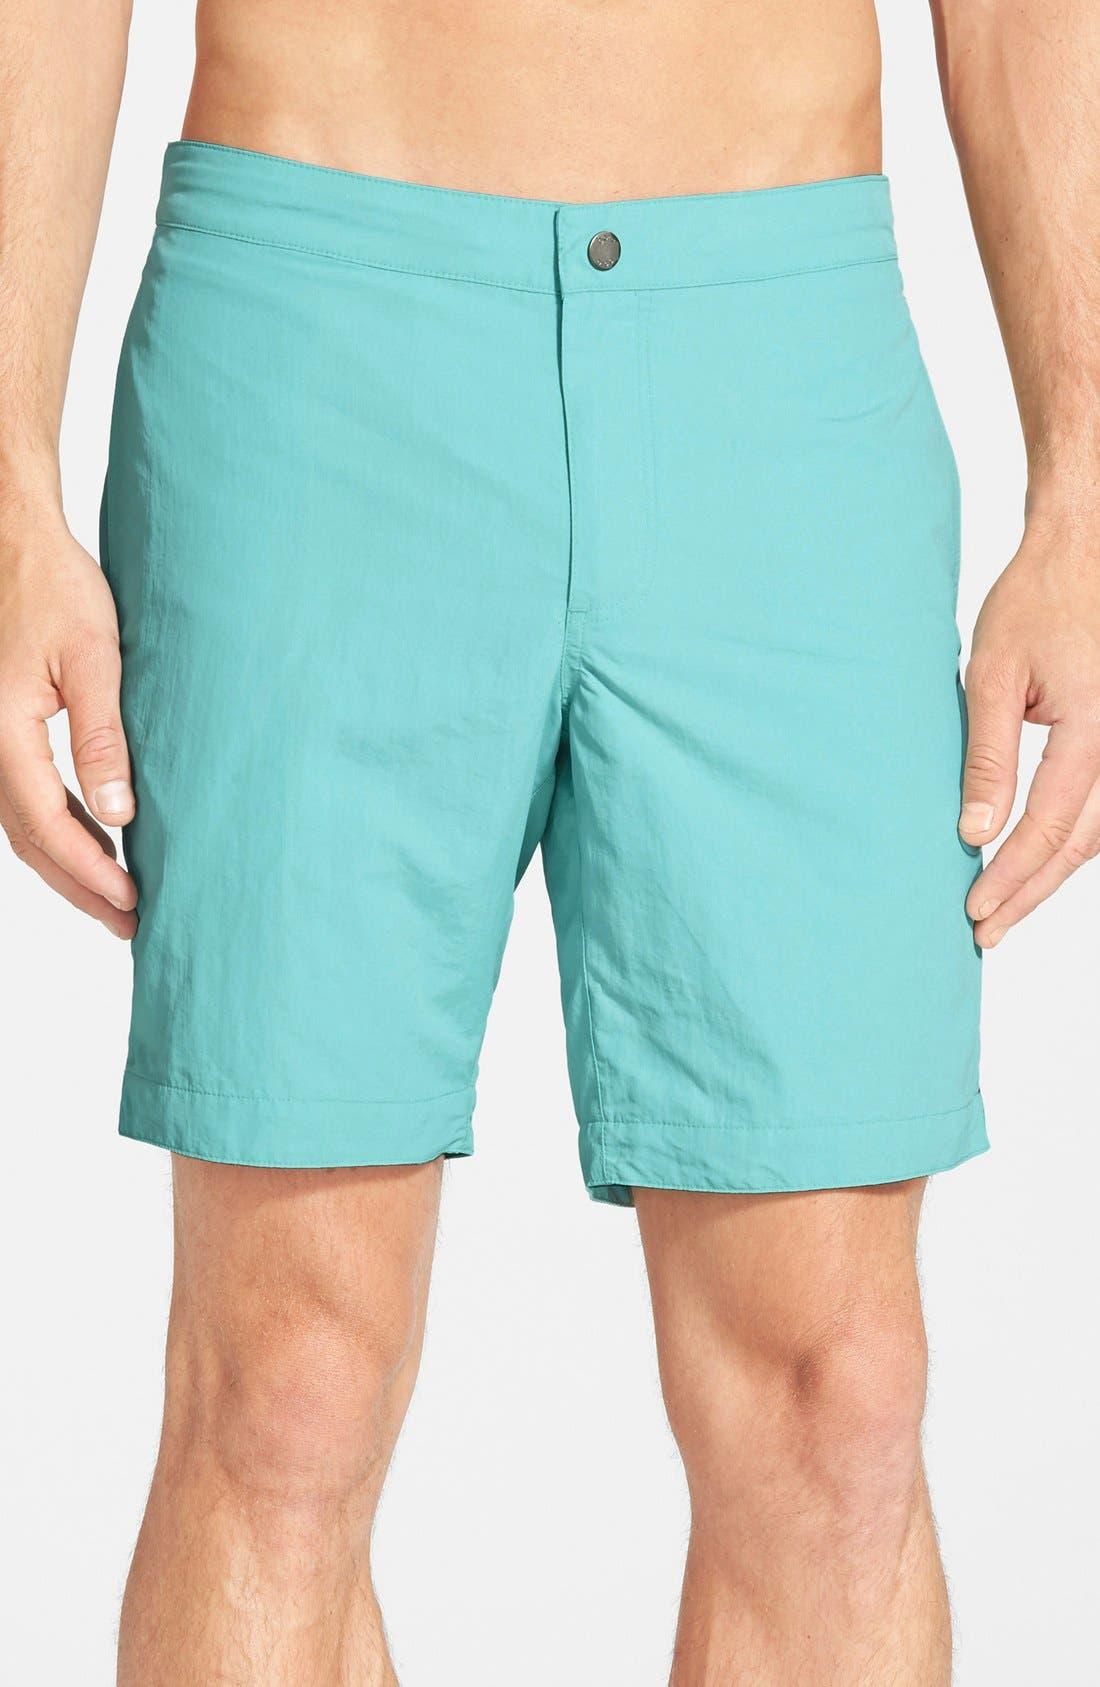 'Aruba - Island' Tailored Fit 8.5 Inch Board Shorts,                             Main thumbnail 3, color,